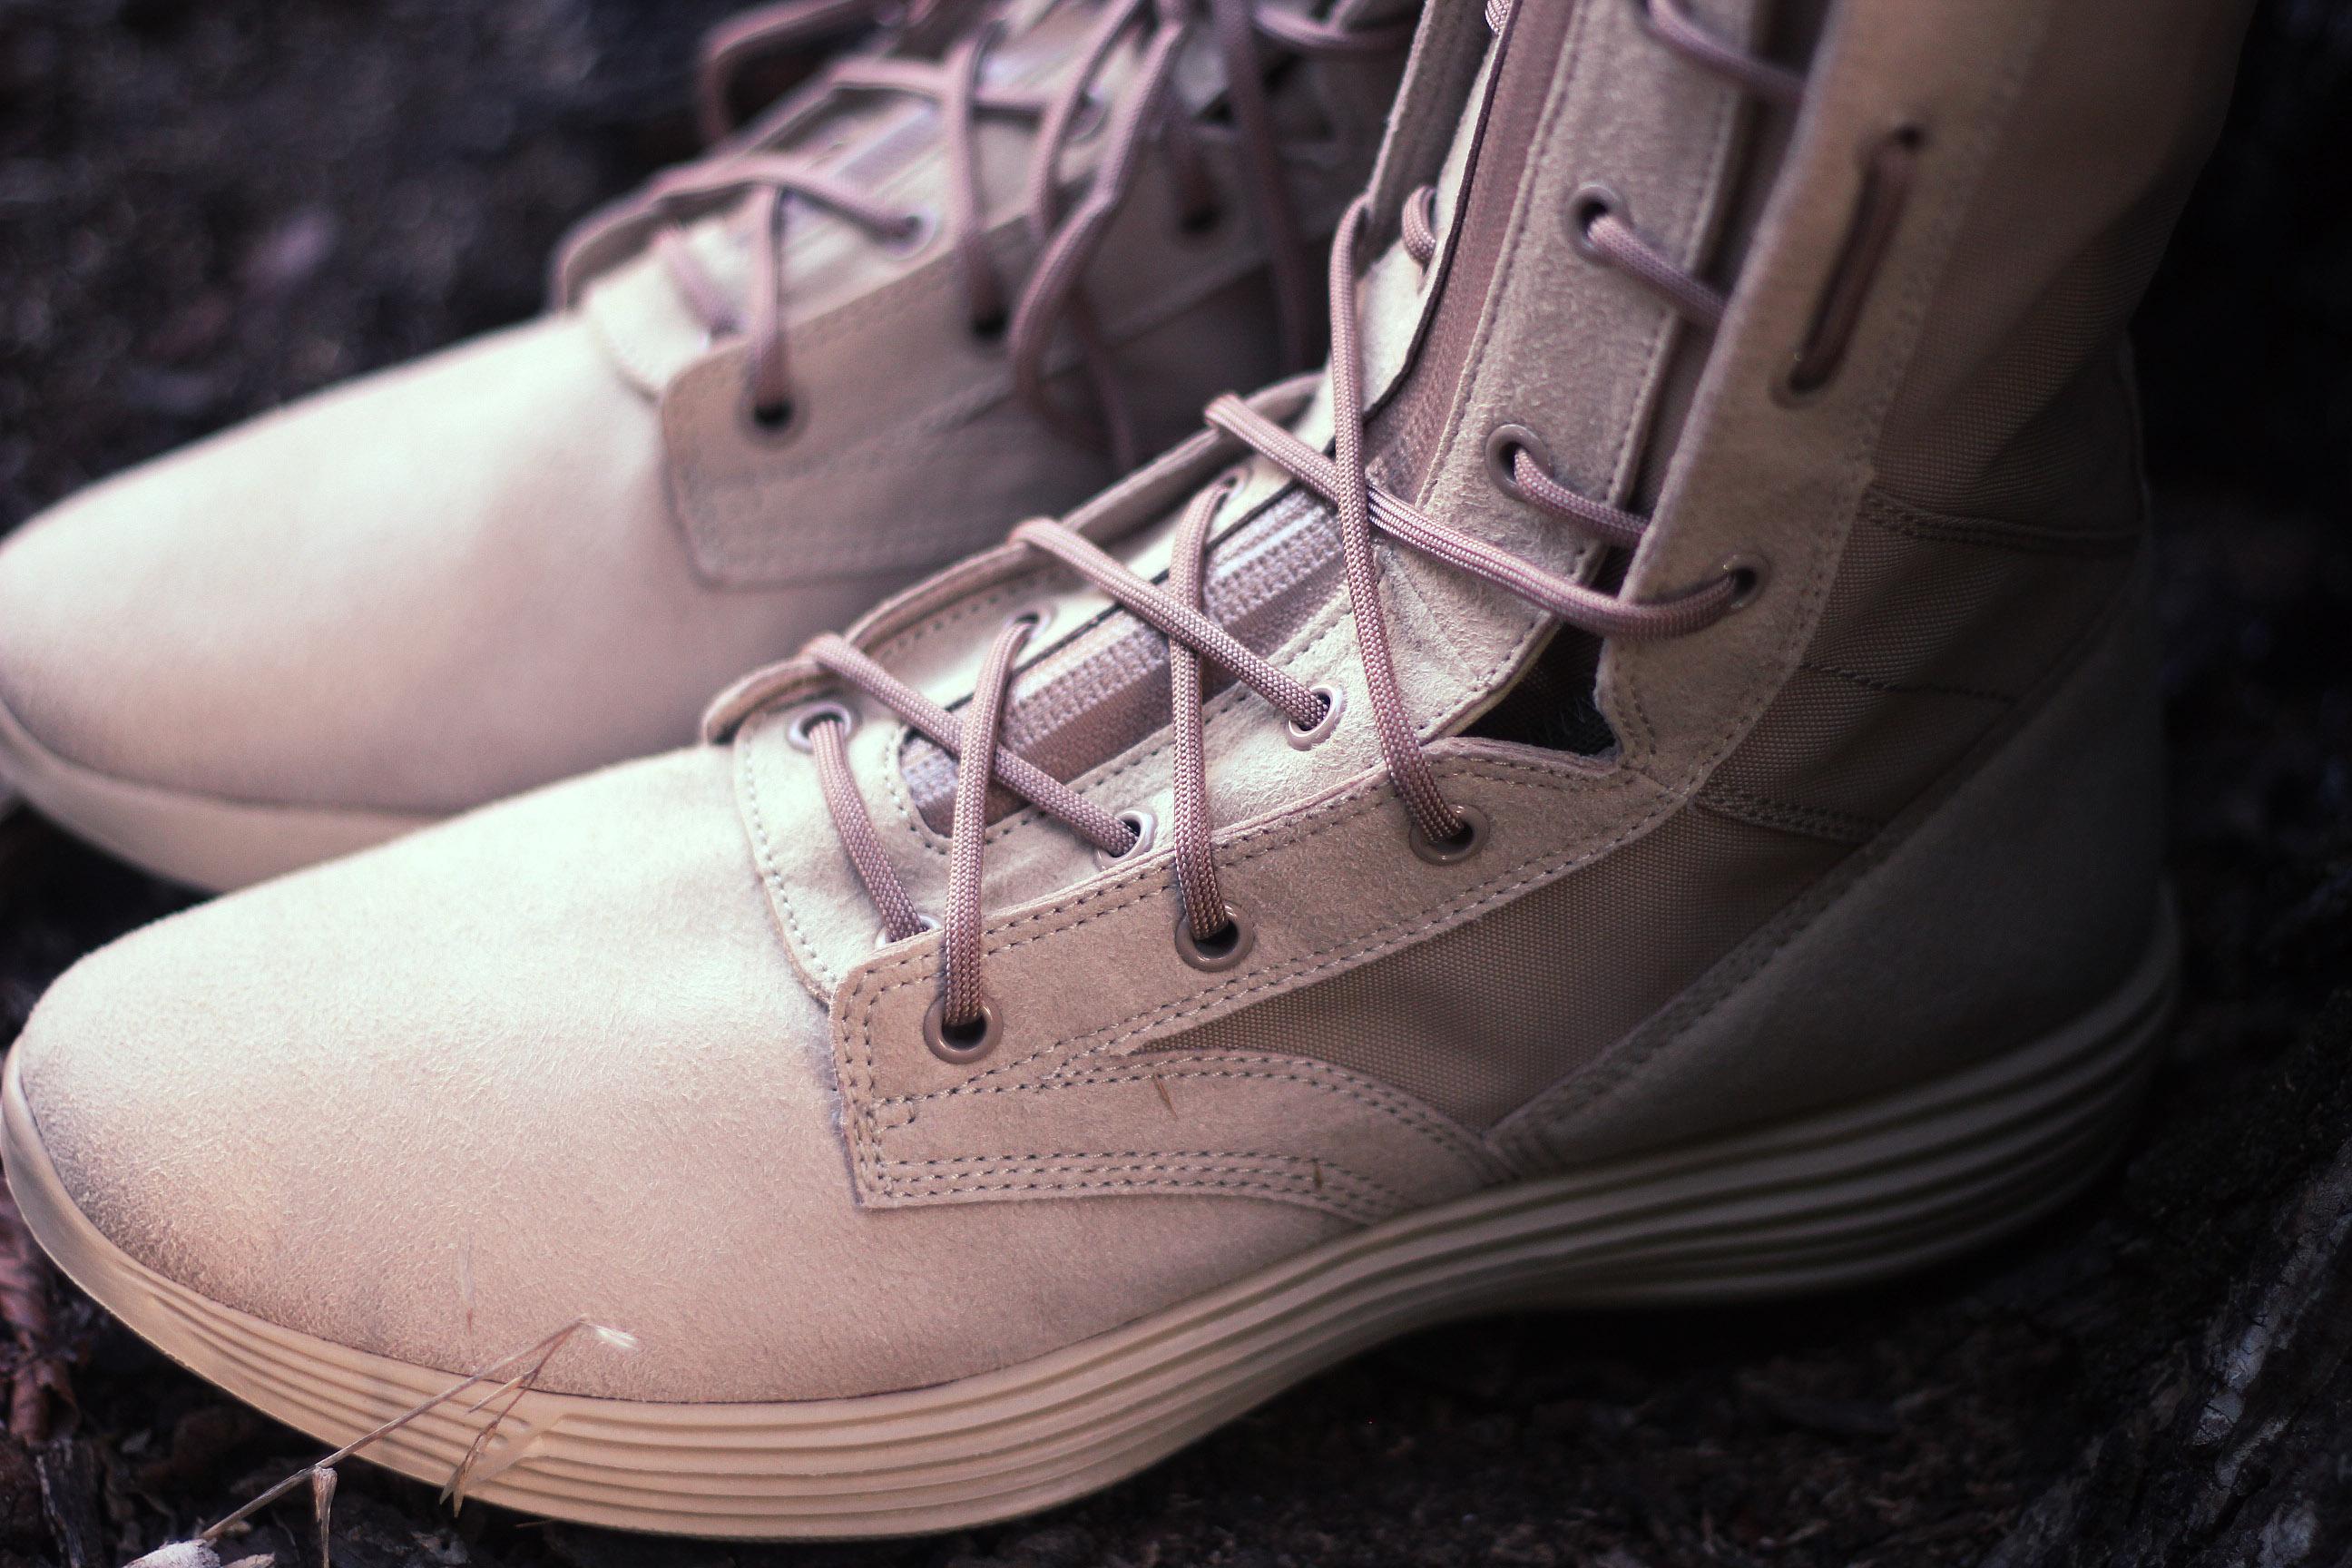 Nike Lunaracer SFB NRG